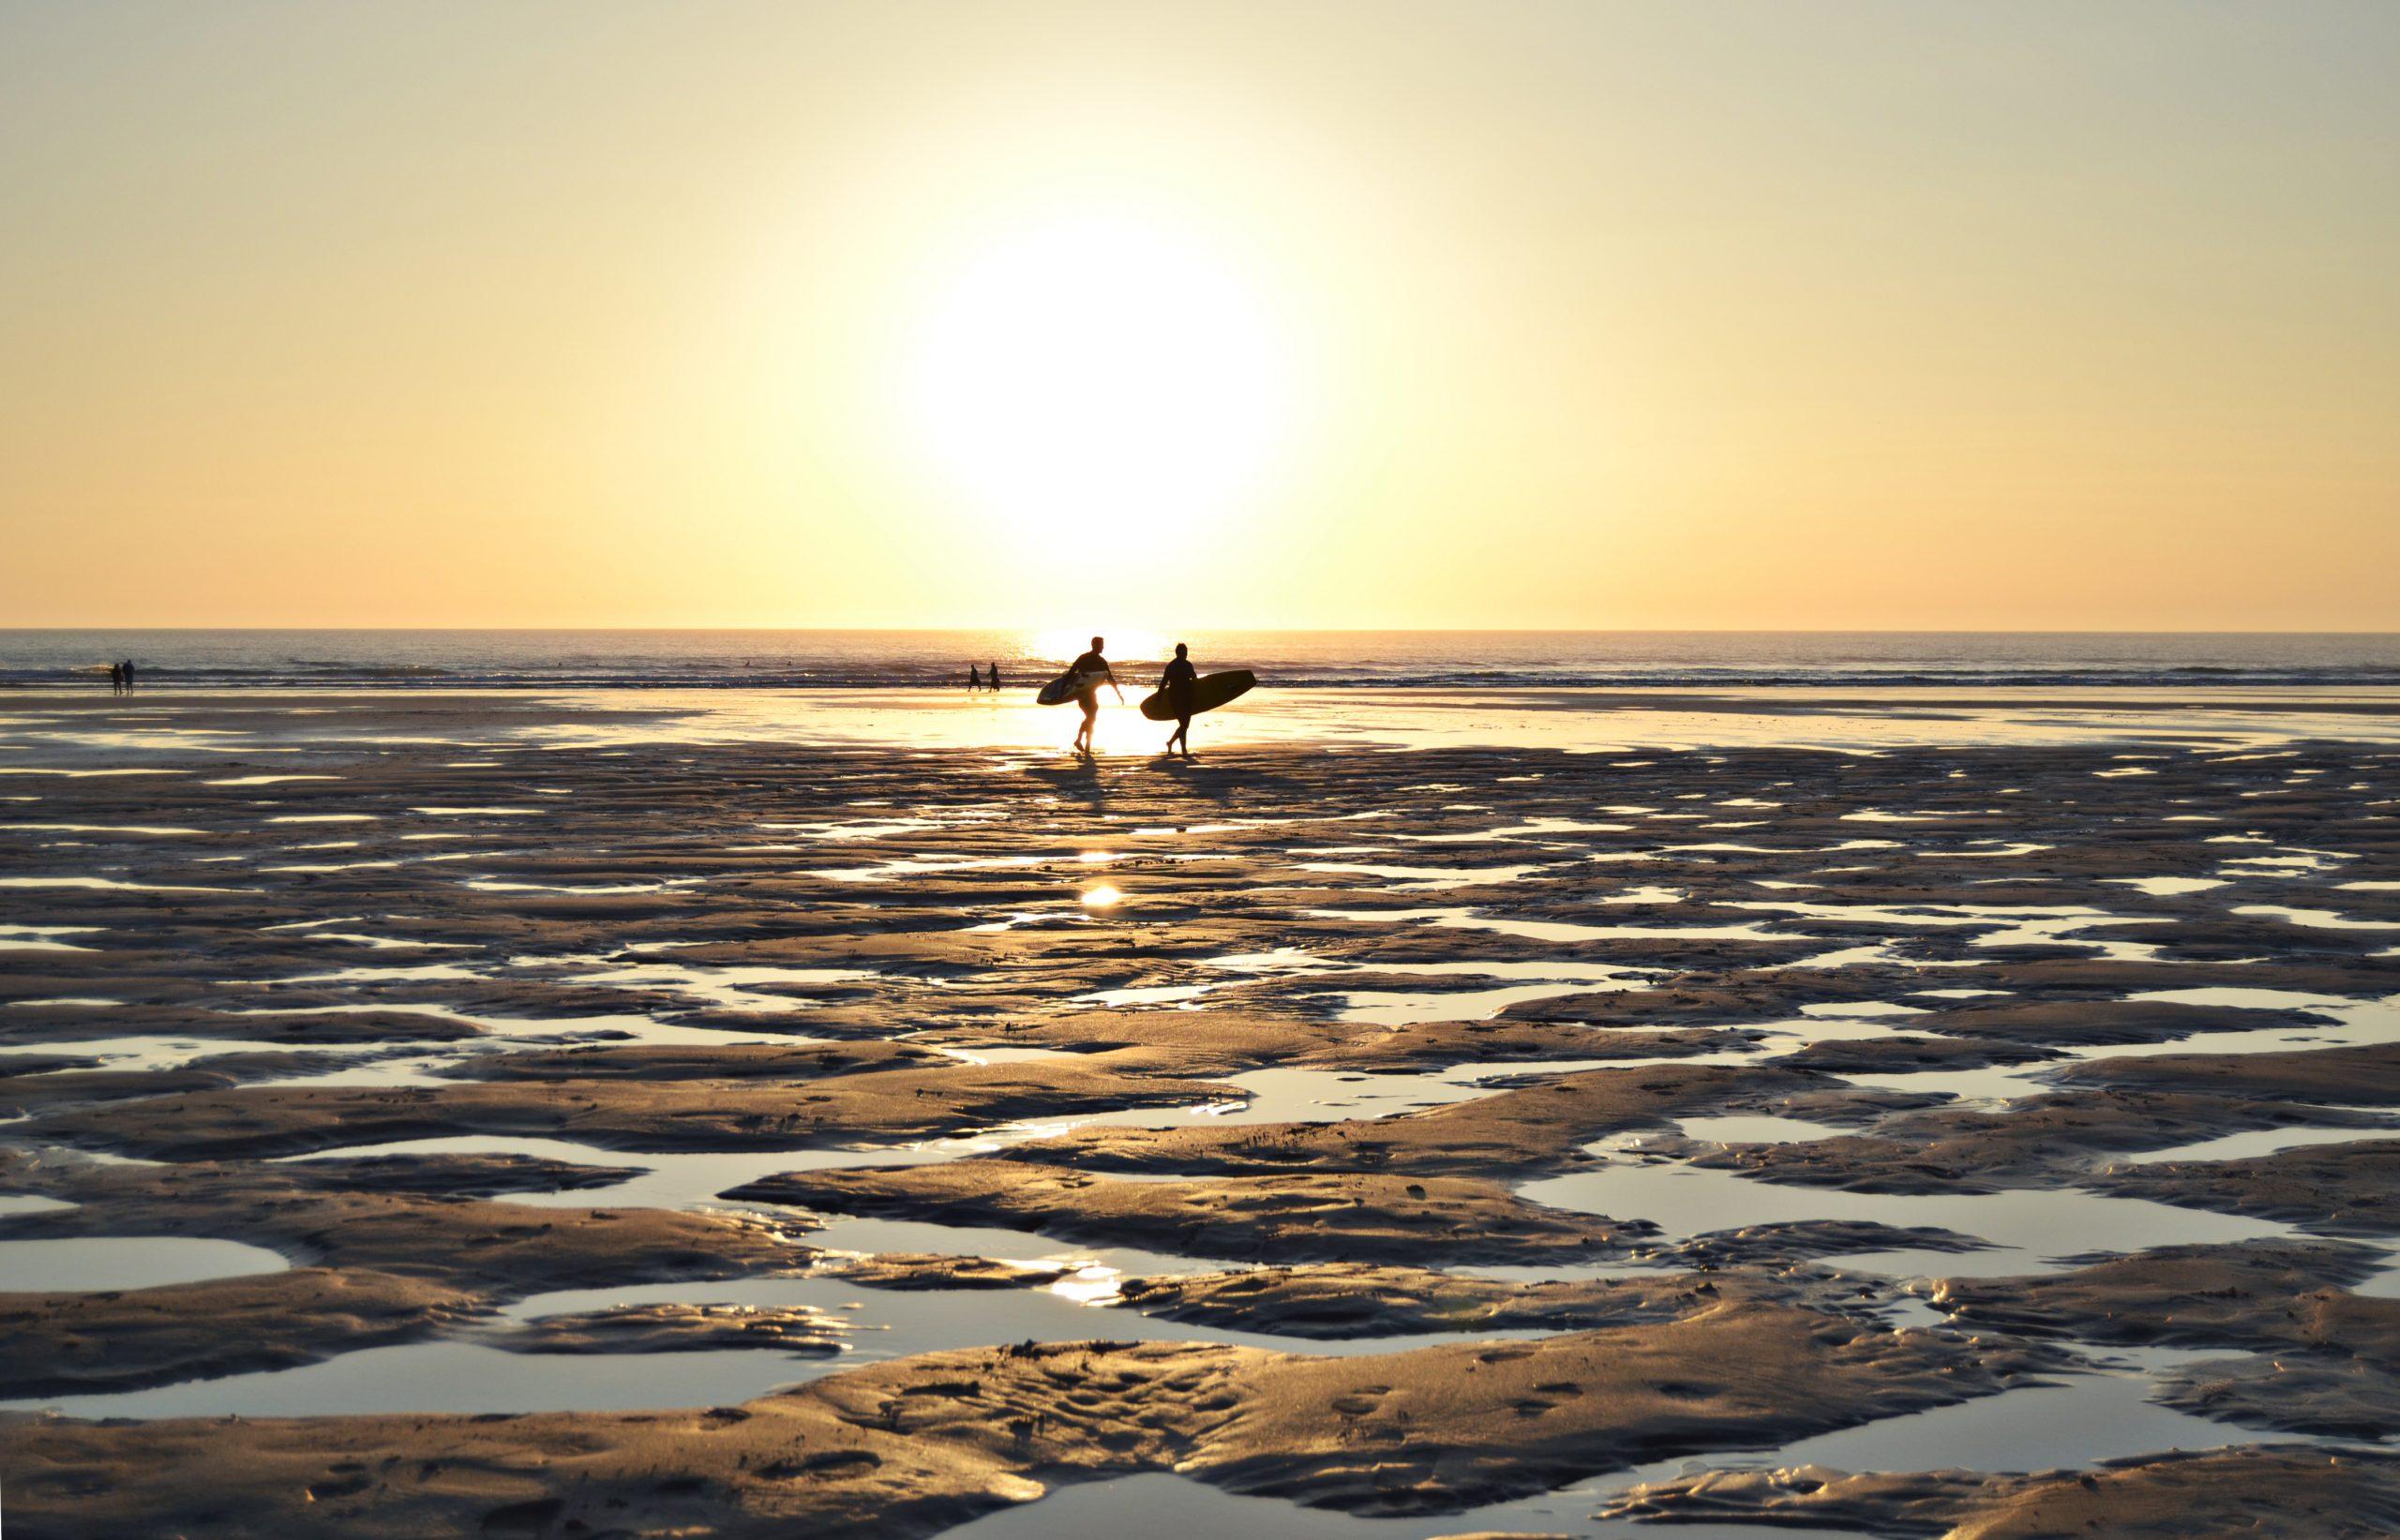 Surfers on a beach at sunrise